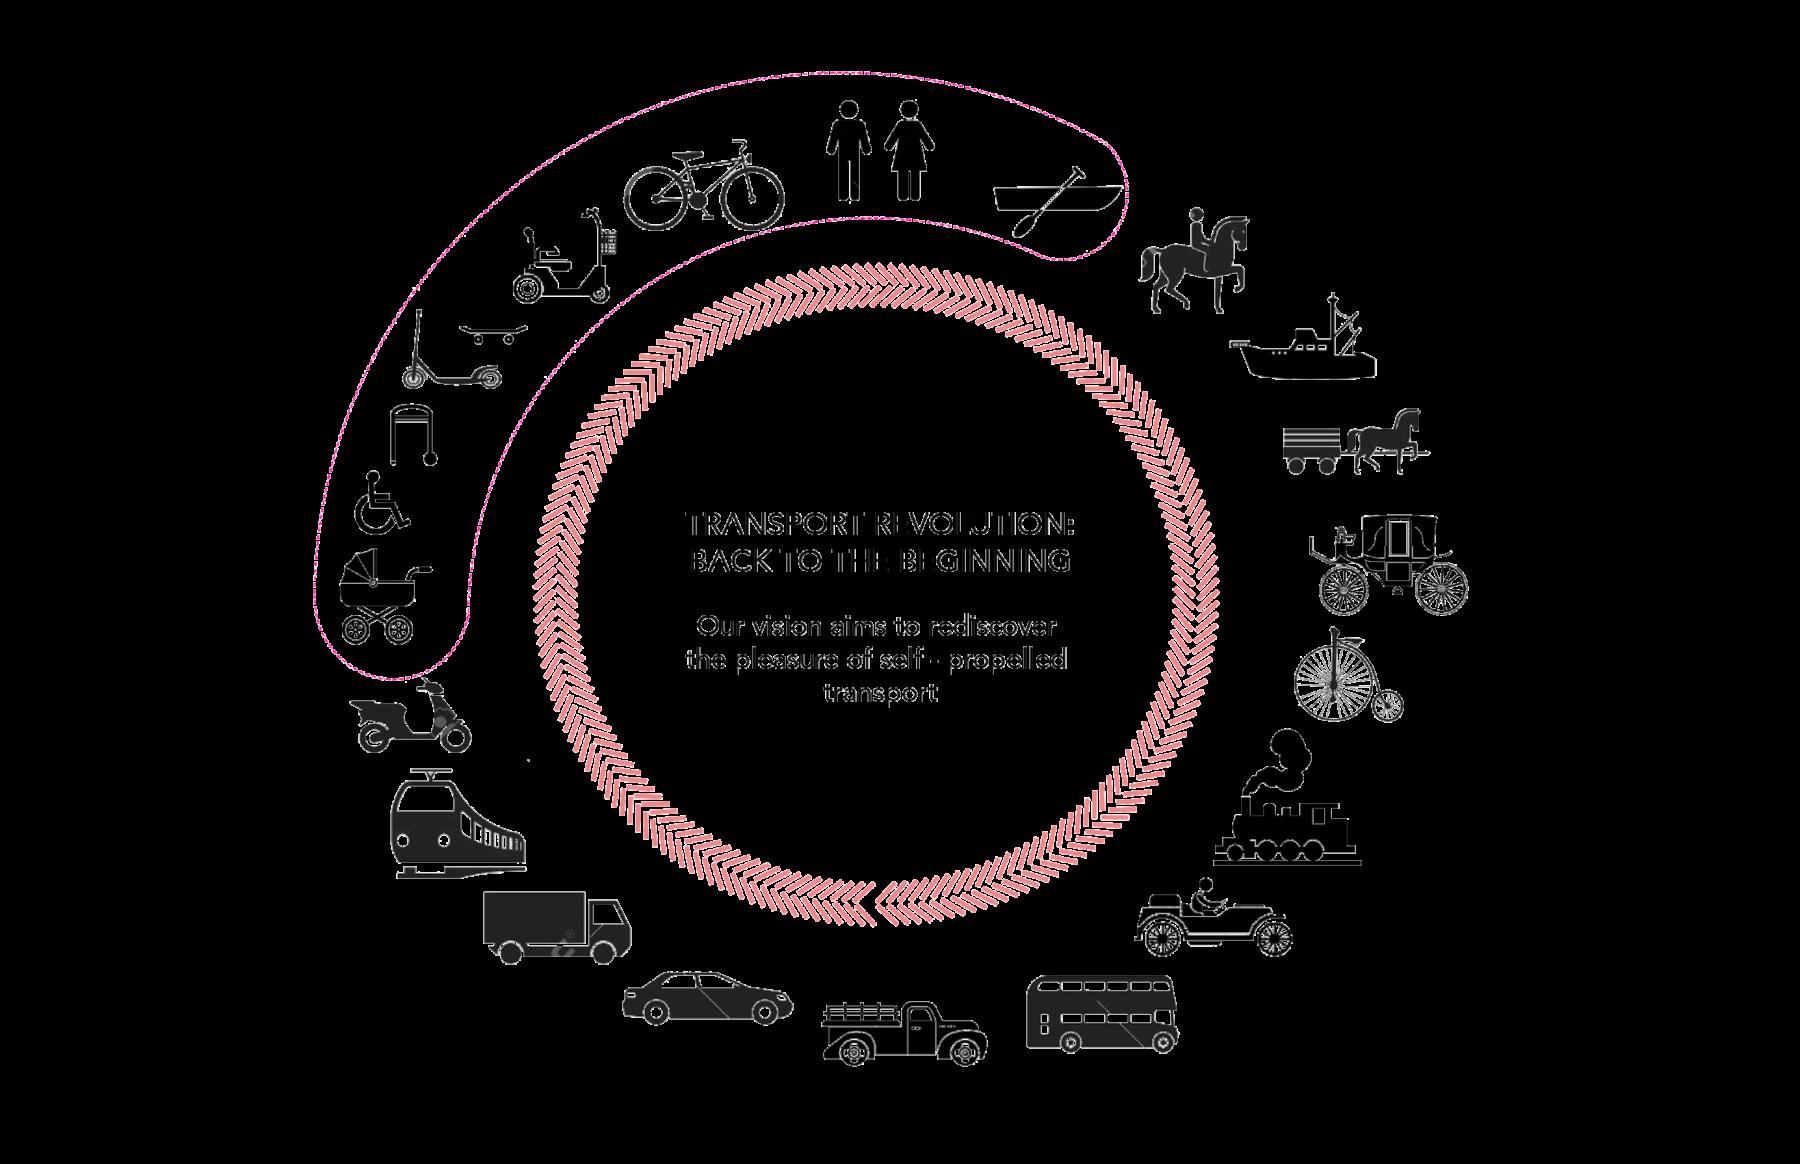 Sarah-Wigglesworth-Architects Kingston-Mini-Holland Diagram Transport-Revolution 3600